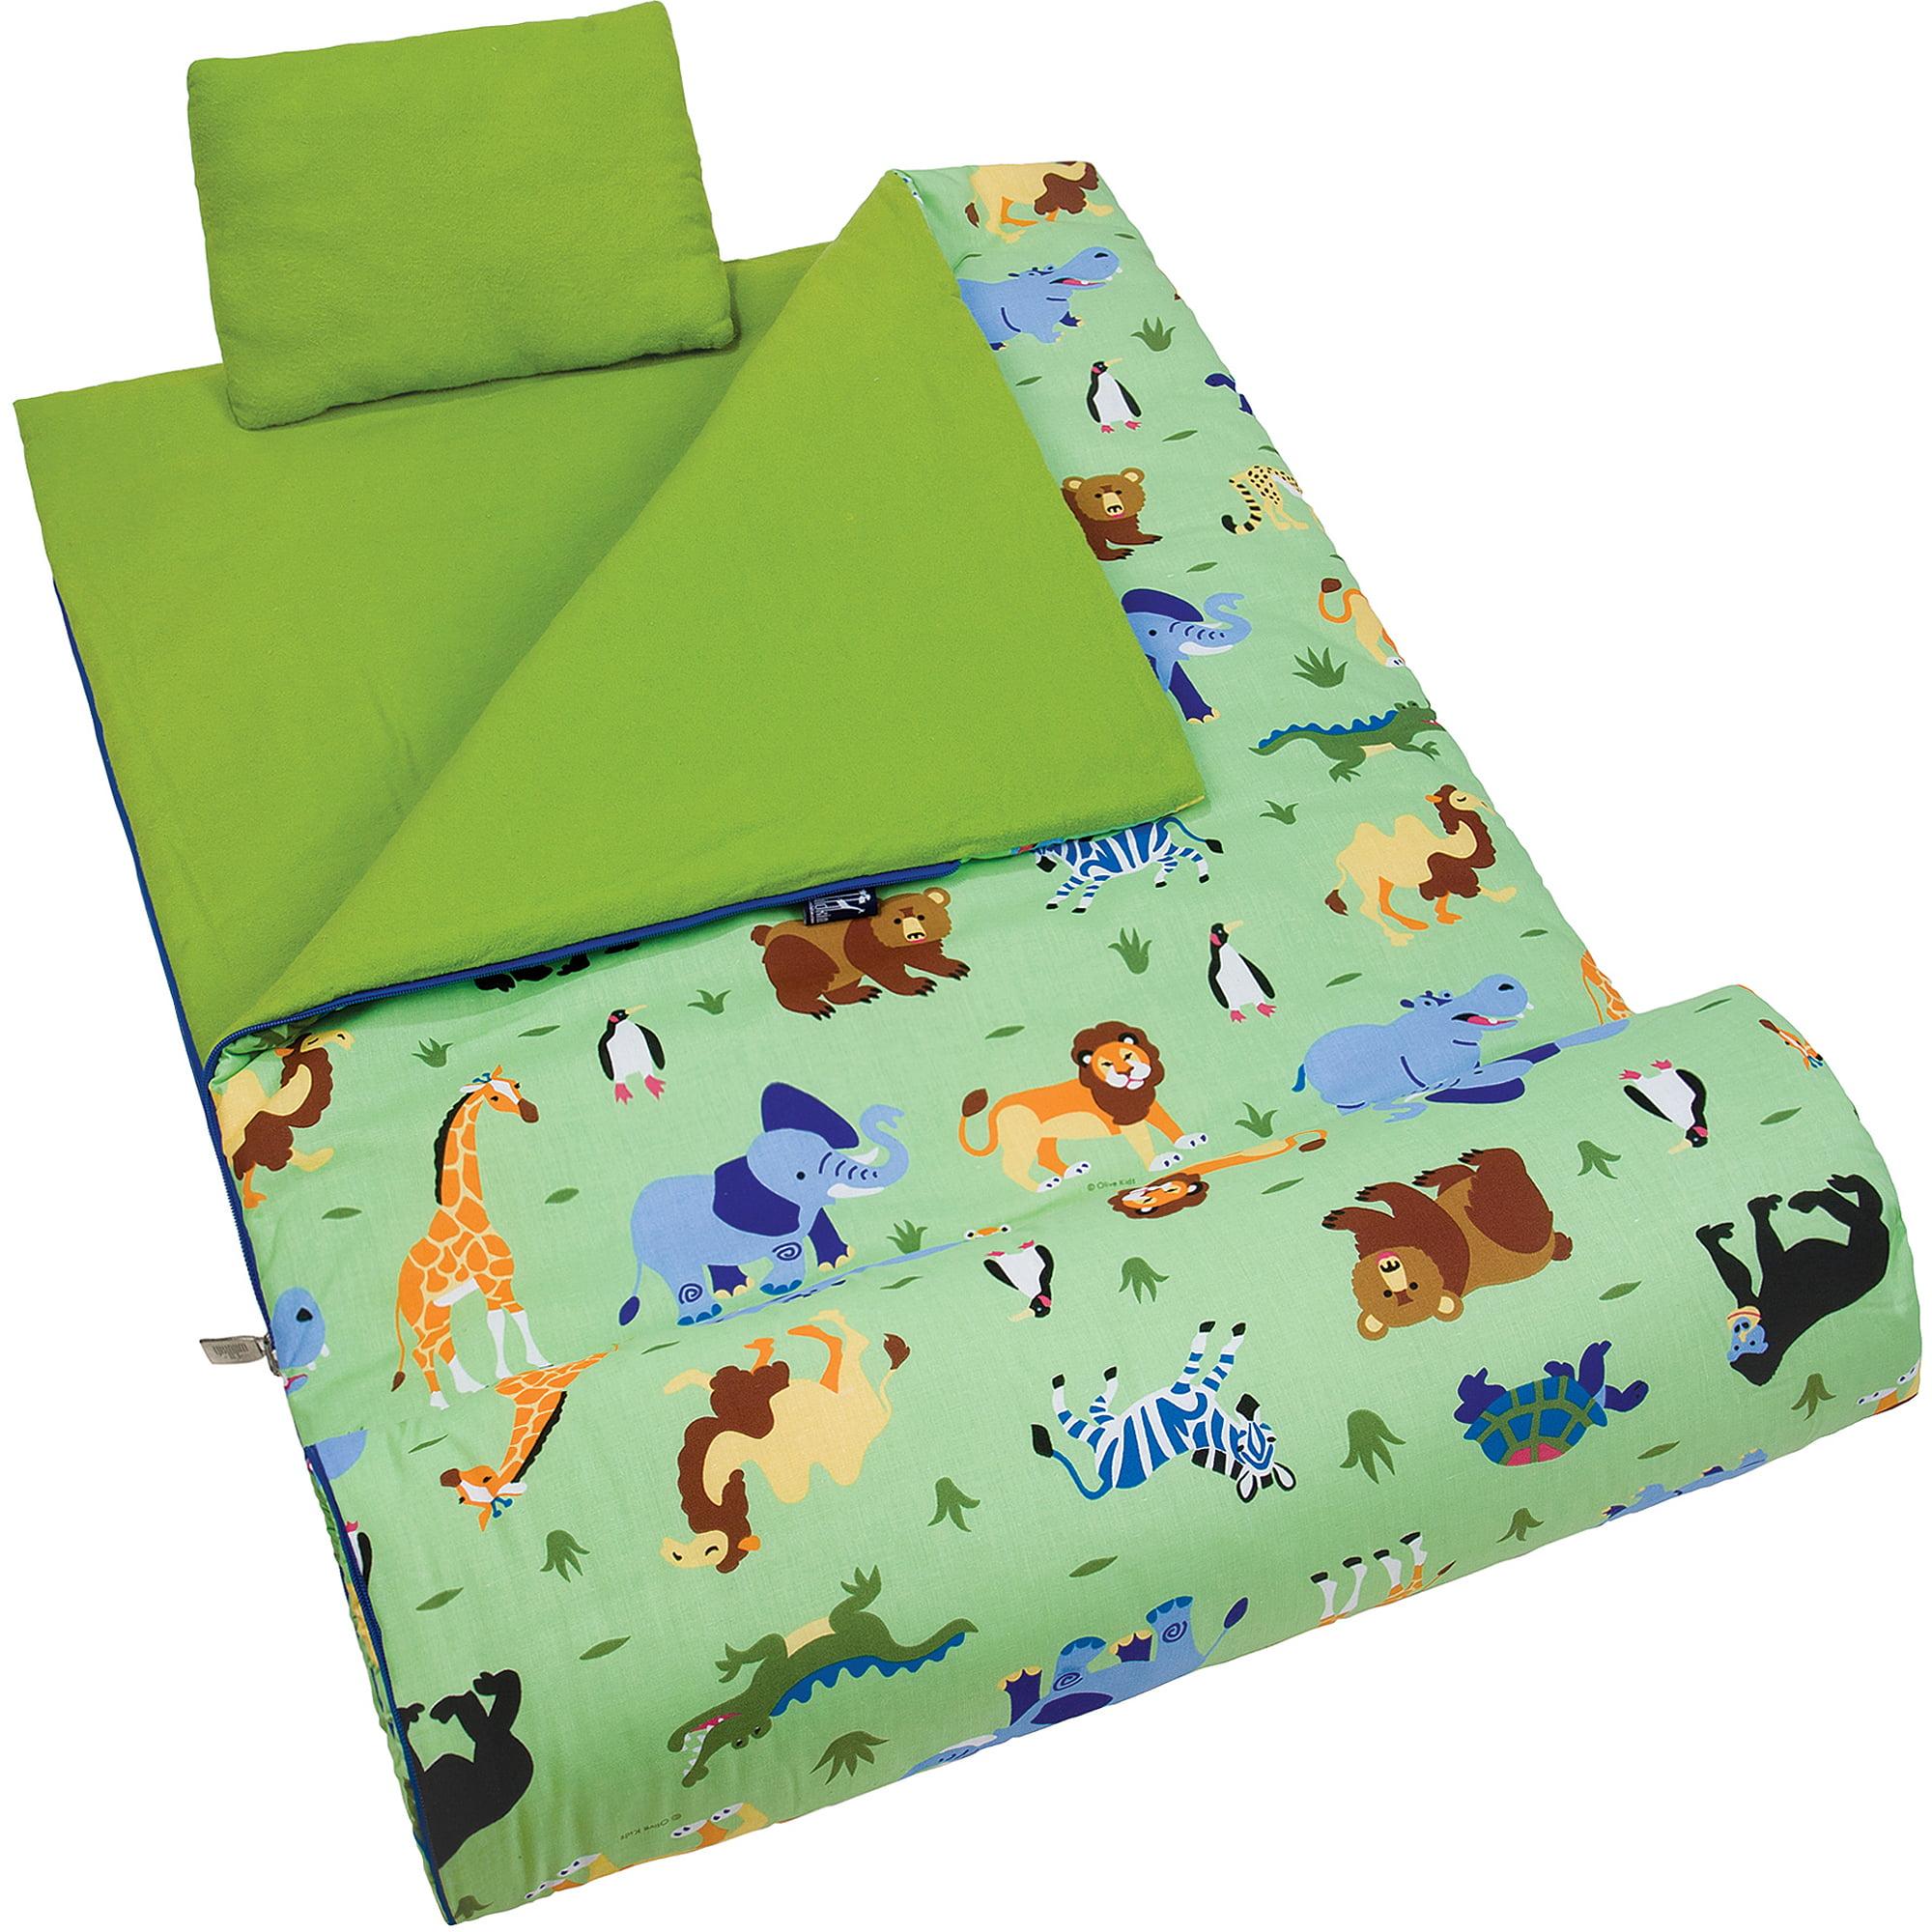 Olive Kids' Wild Animals Sleeping Bag